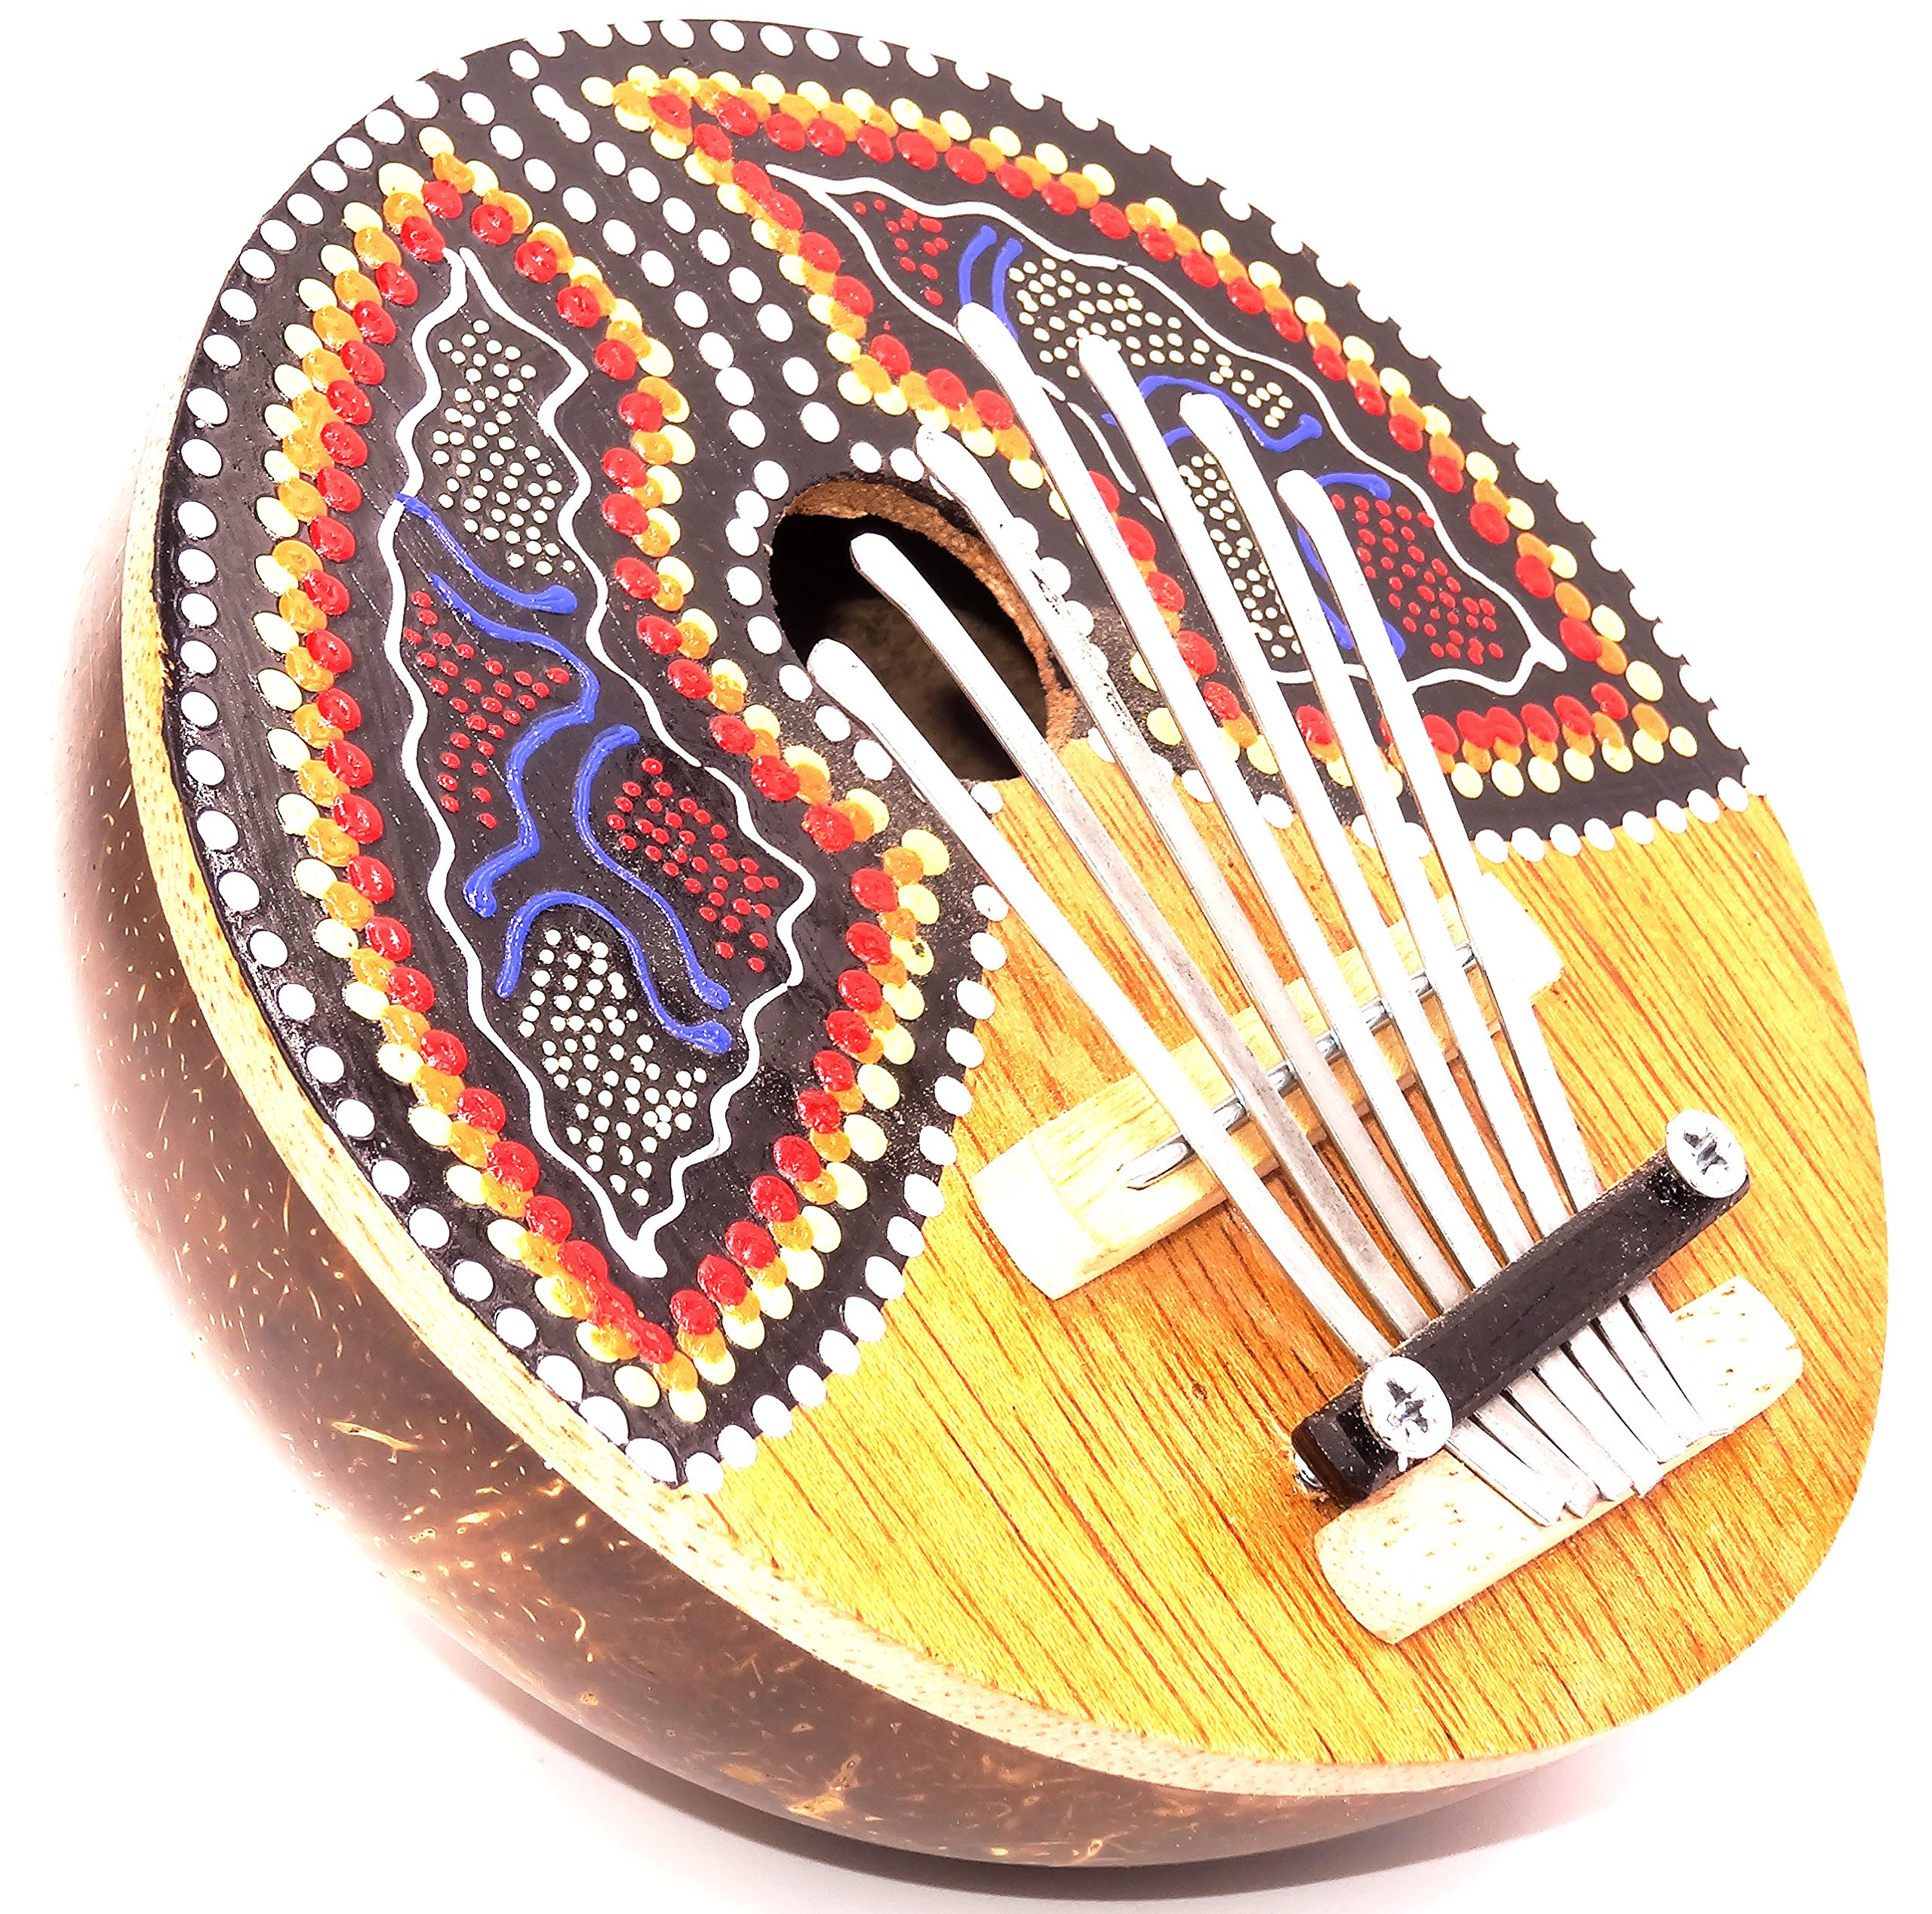 Karimba Kalimba Chitarra Pianoforte a pollice Sanza Cocco strumento musica Aborigeno da parati blu